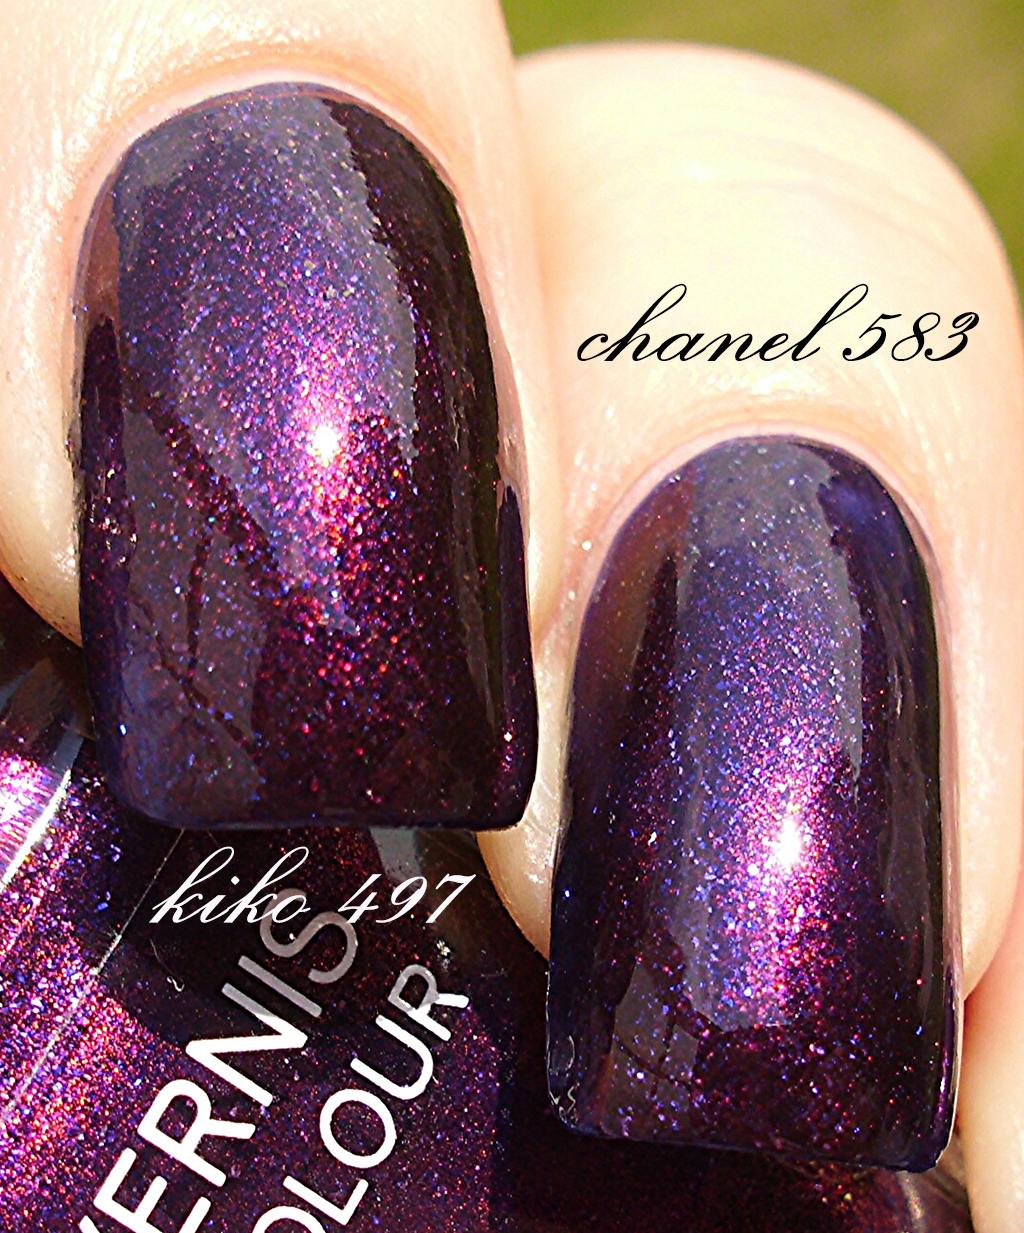 Kiko 497 Pearly Indian Summer Vs Chanel 583 Taboo Nagellack 2 0 Kiko 497 Dupe For